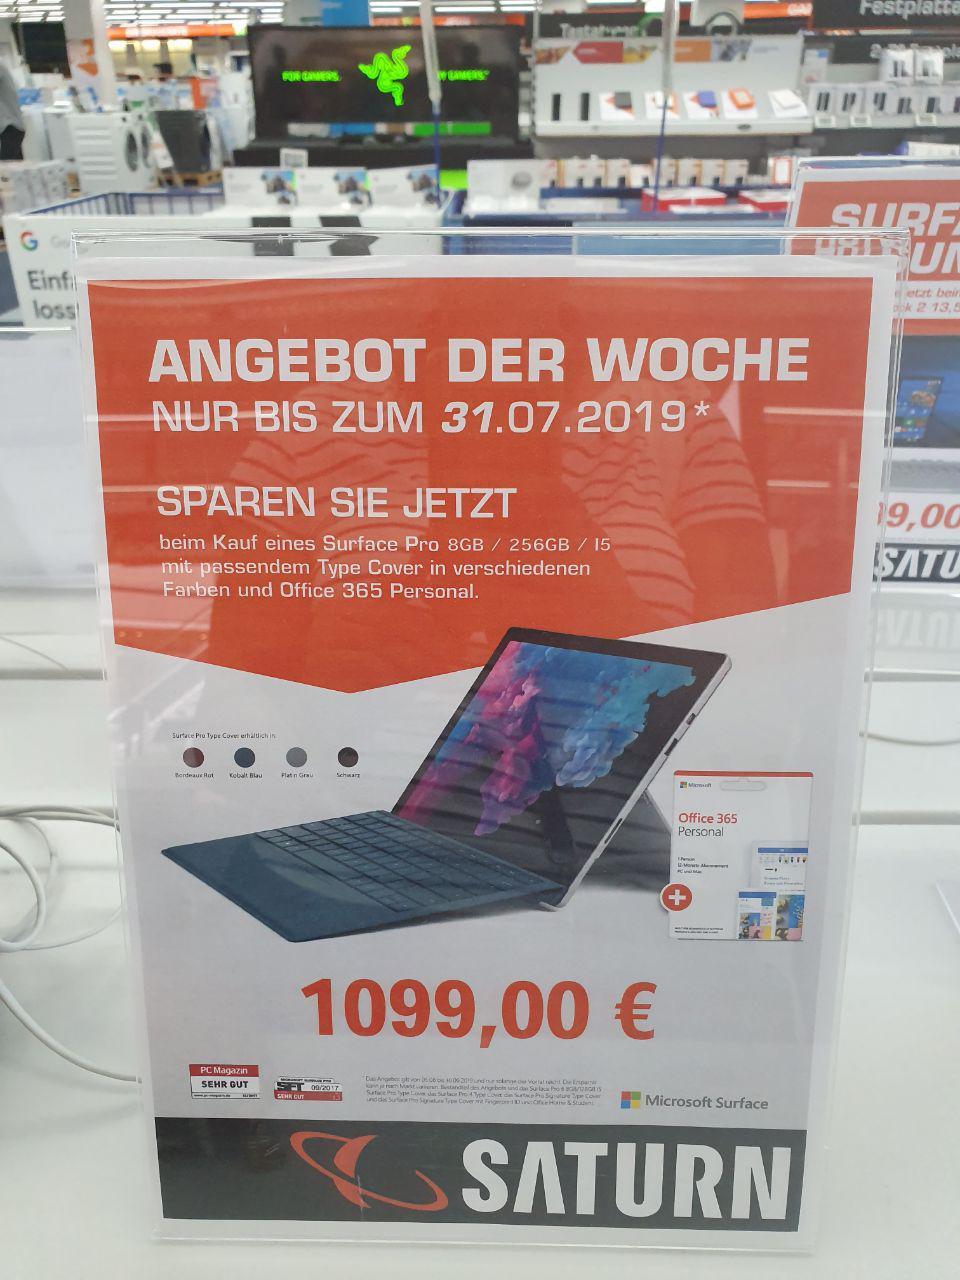 [LOKAL SB] Microsoft Surface Pro 6 (i5, 8 GB, 256 SSD) + Type Cover + 1 Jahr Office für 1099 Euro